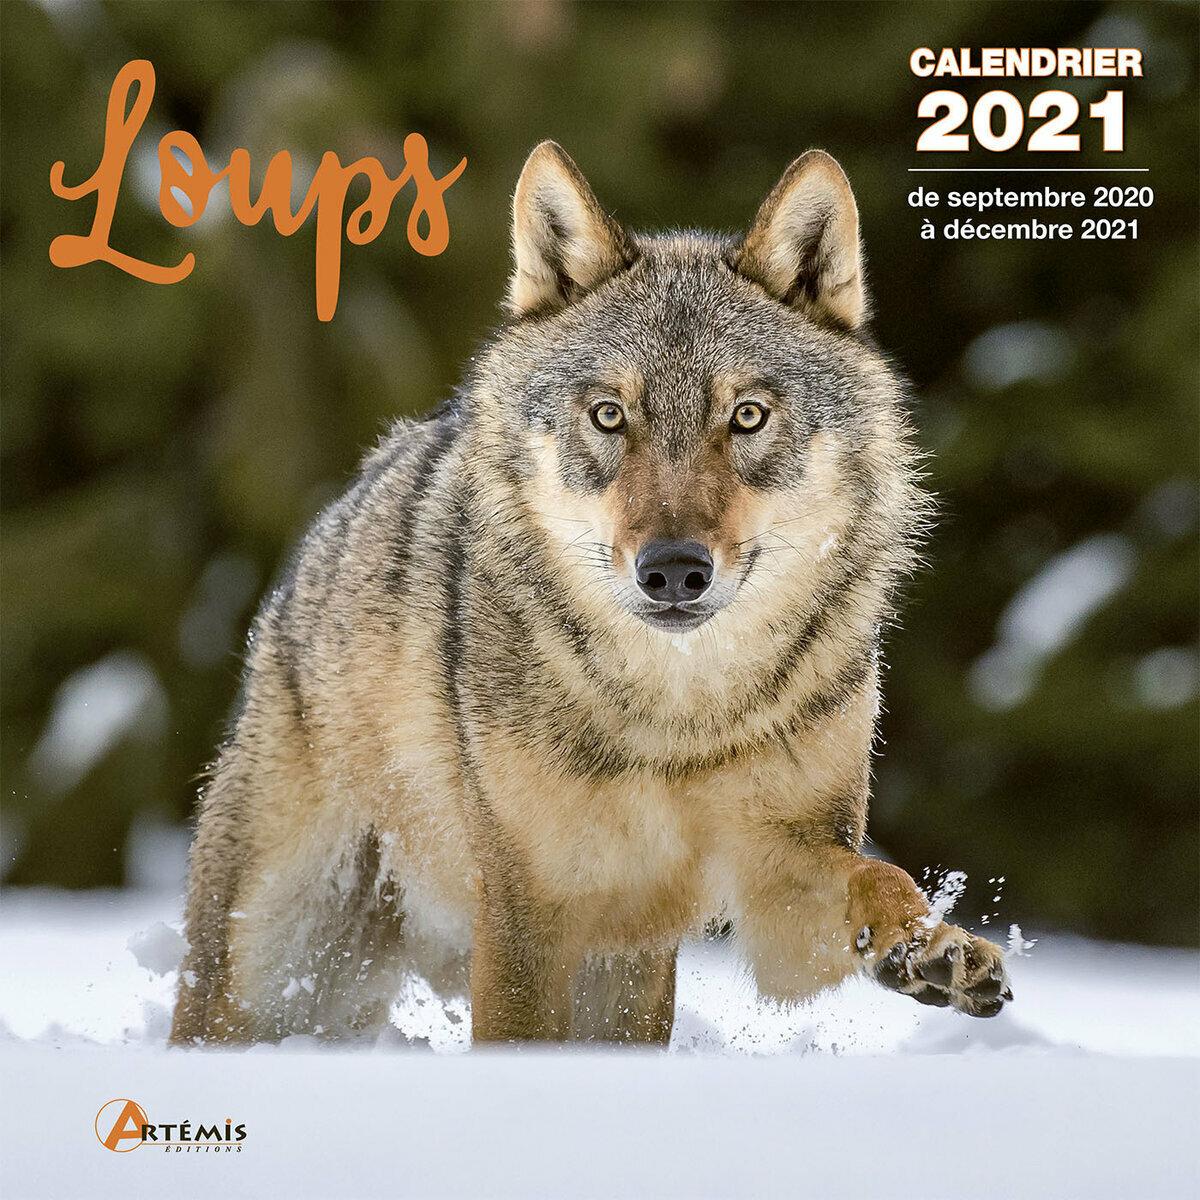 Calendrier Loup 2021 Calendrier 2021 Loup